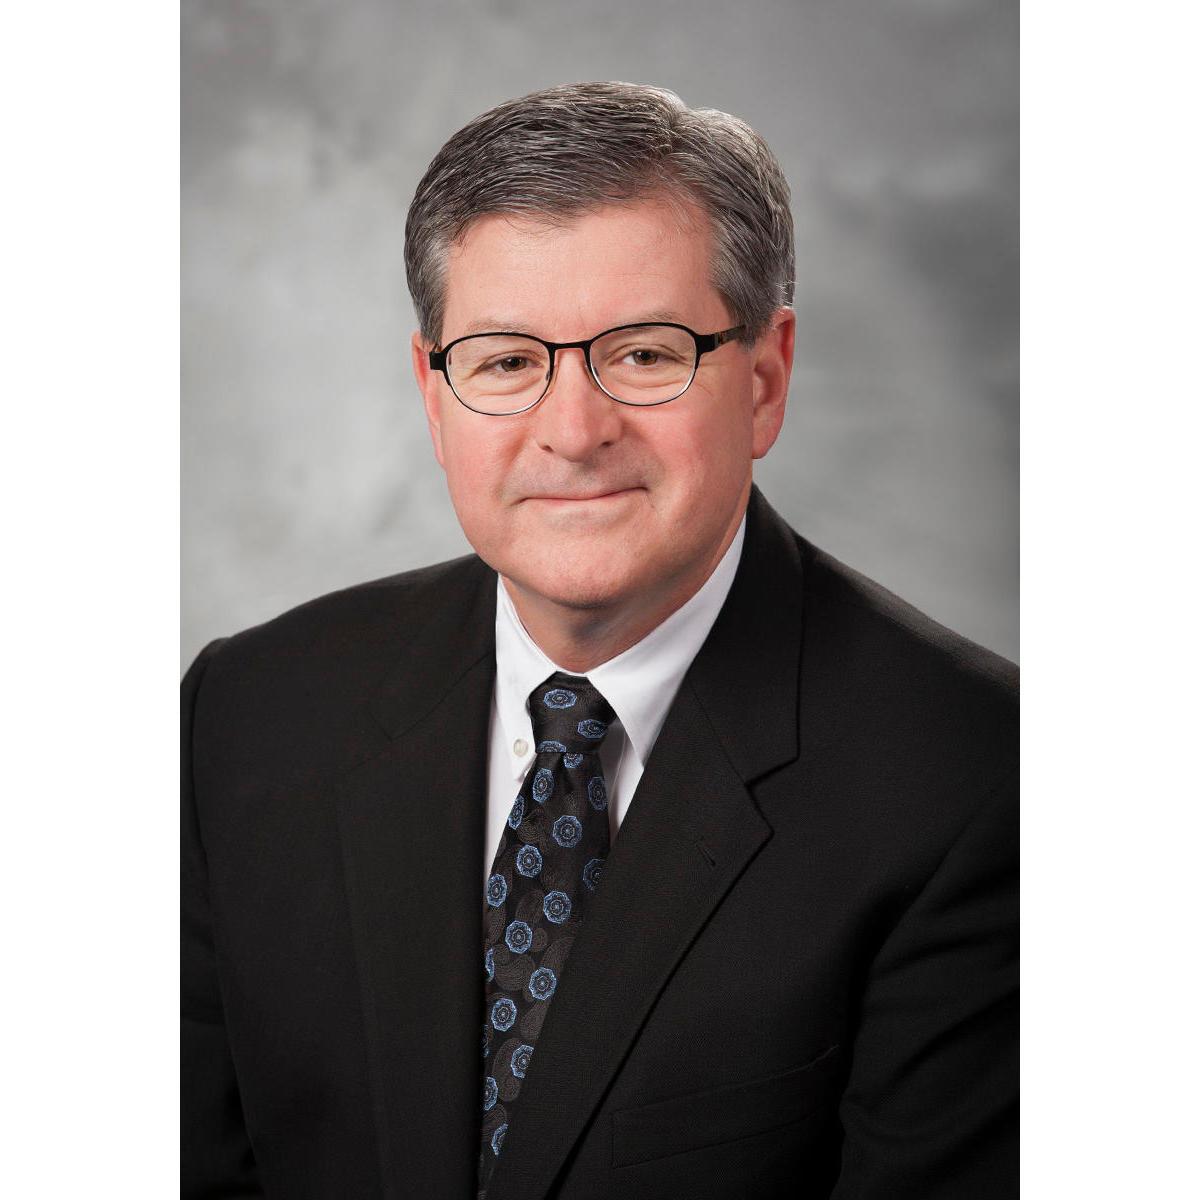 John C. Eggenberger, MD